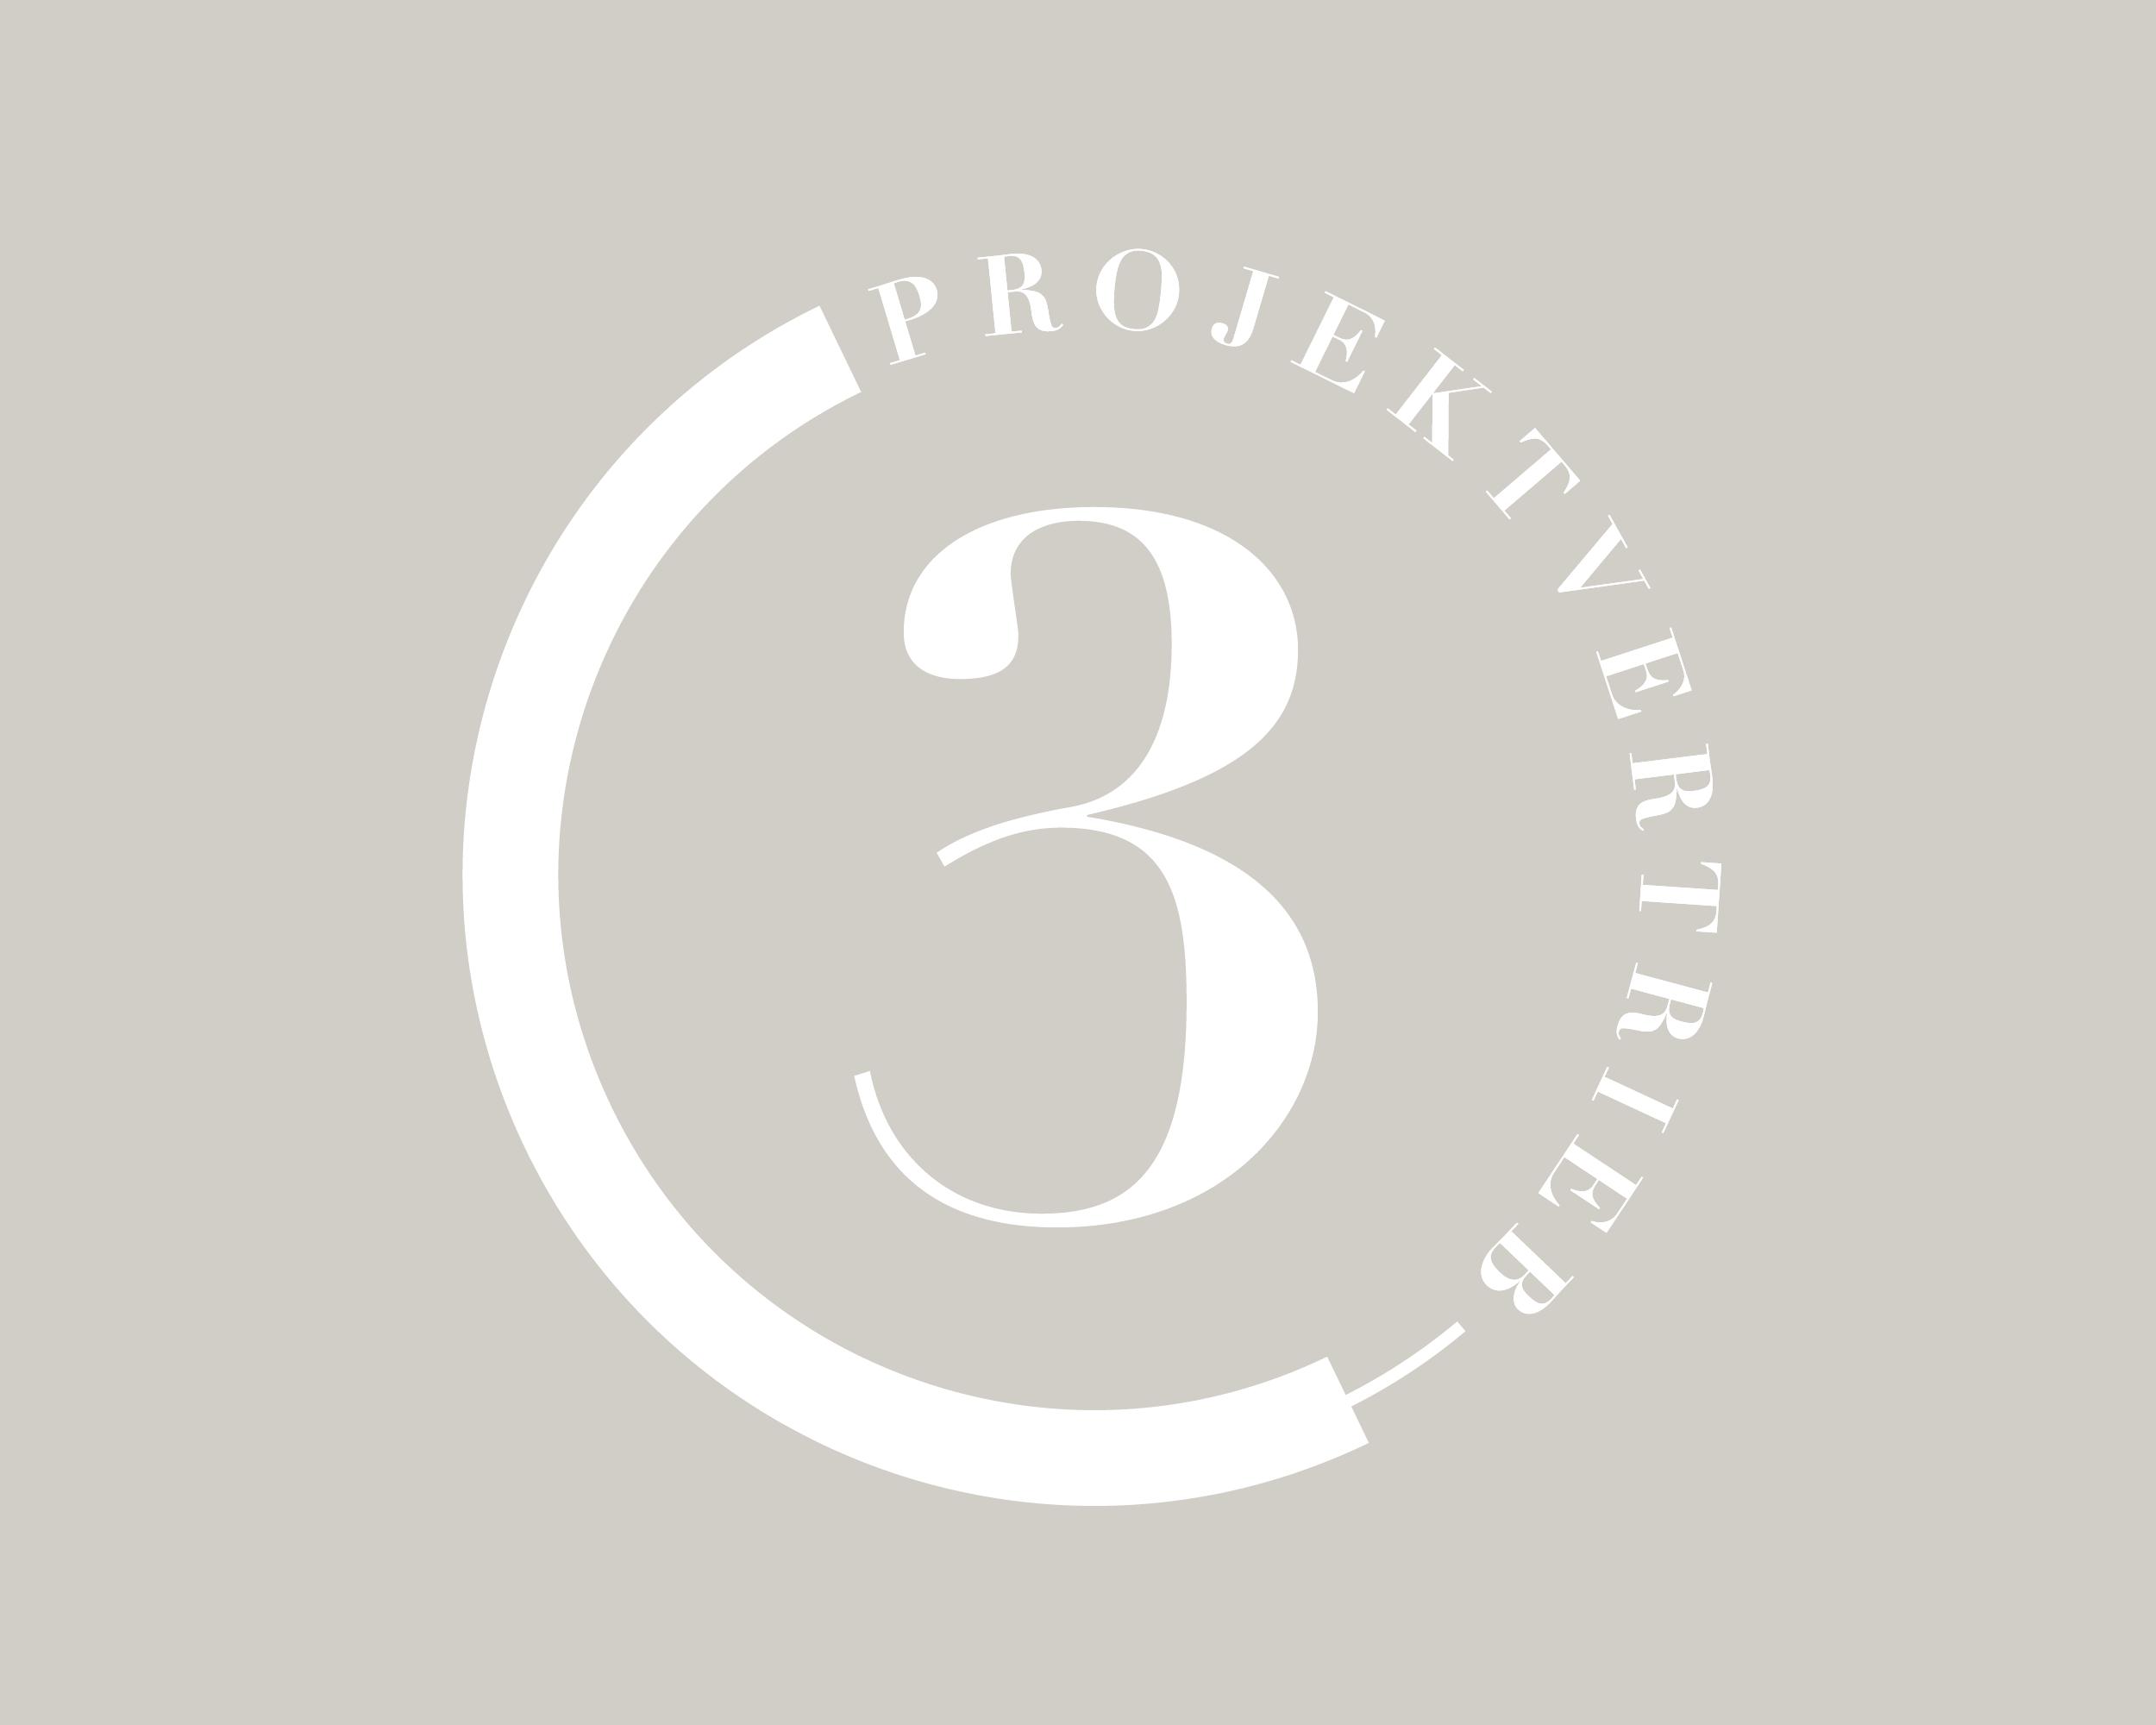 03-ipm_projektvertrieb.png